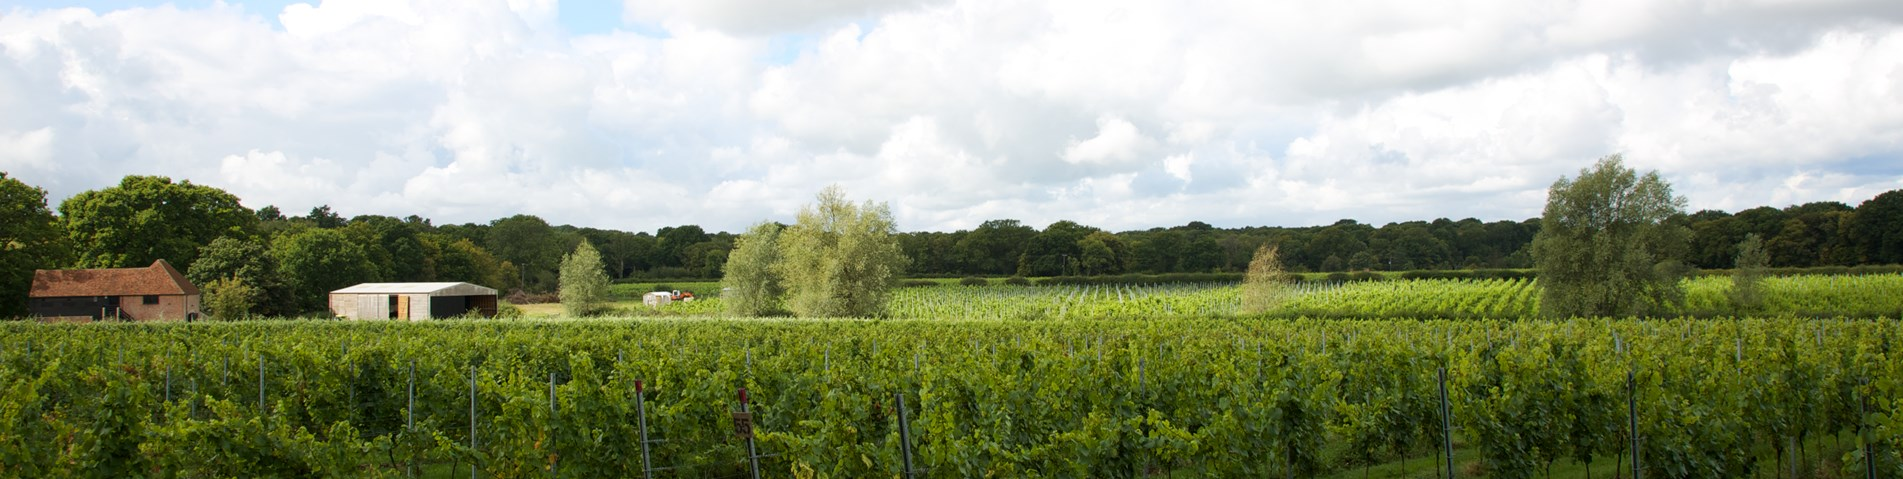 Oxney Estate Vineyard